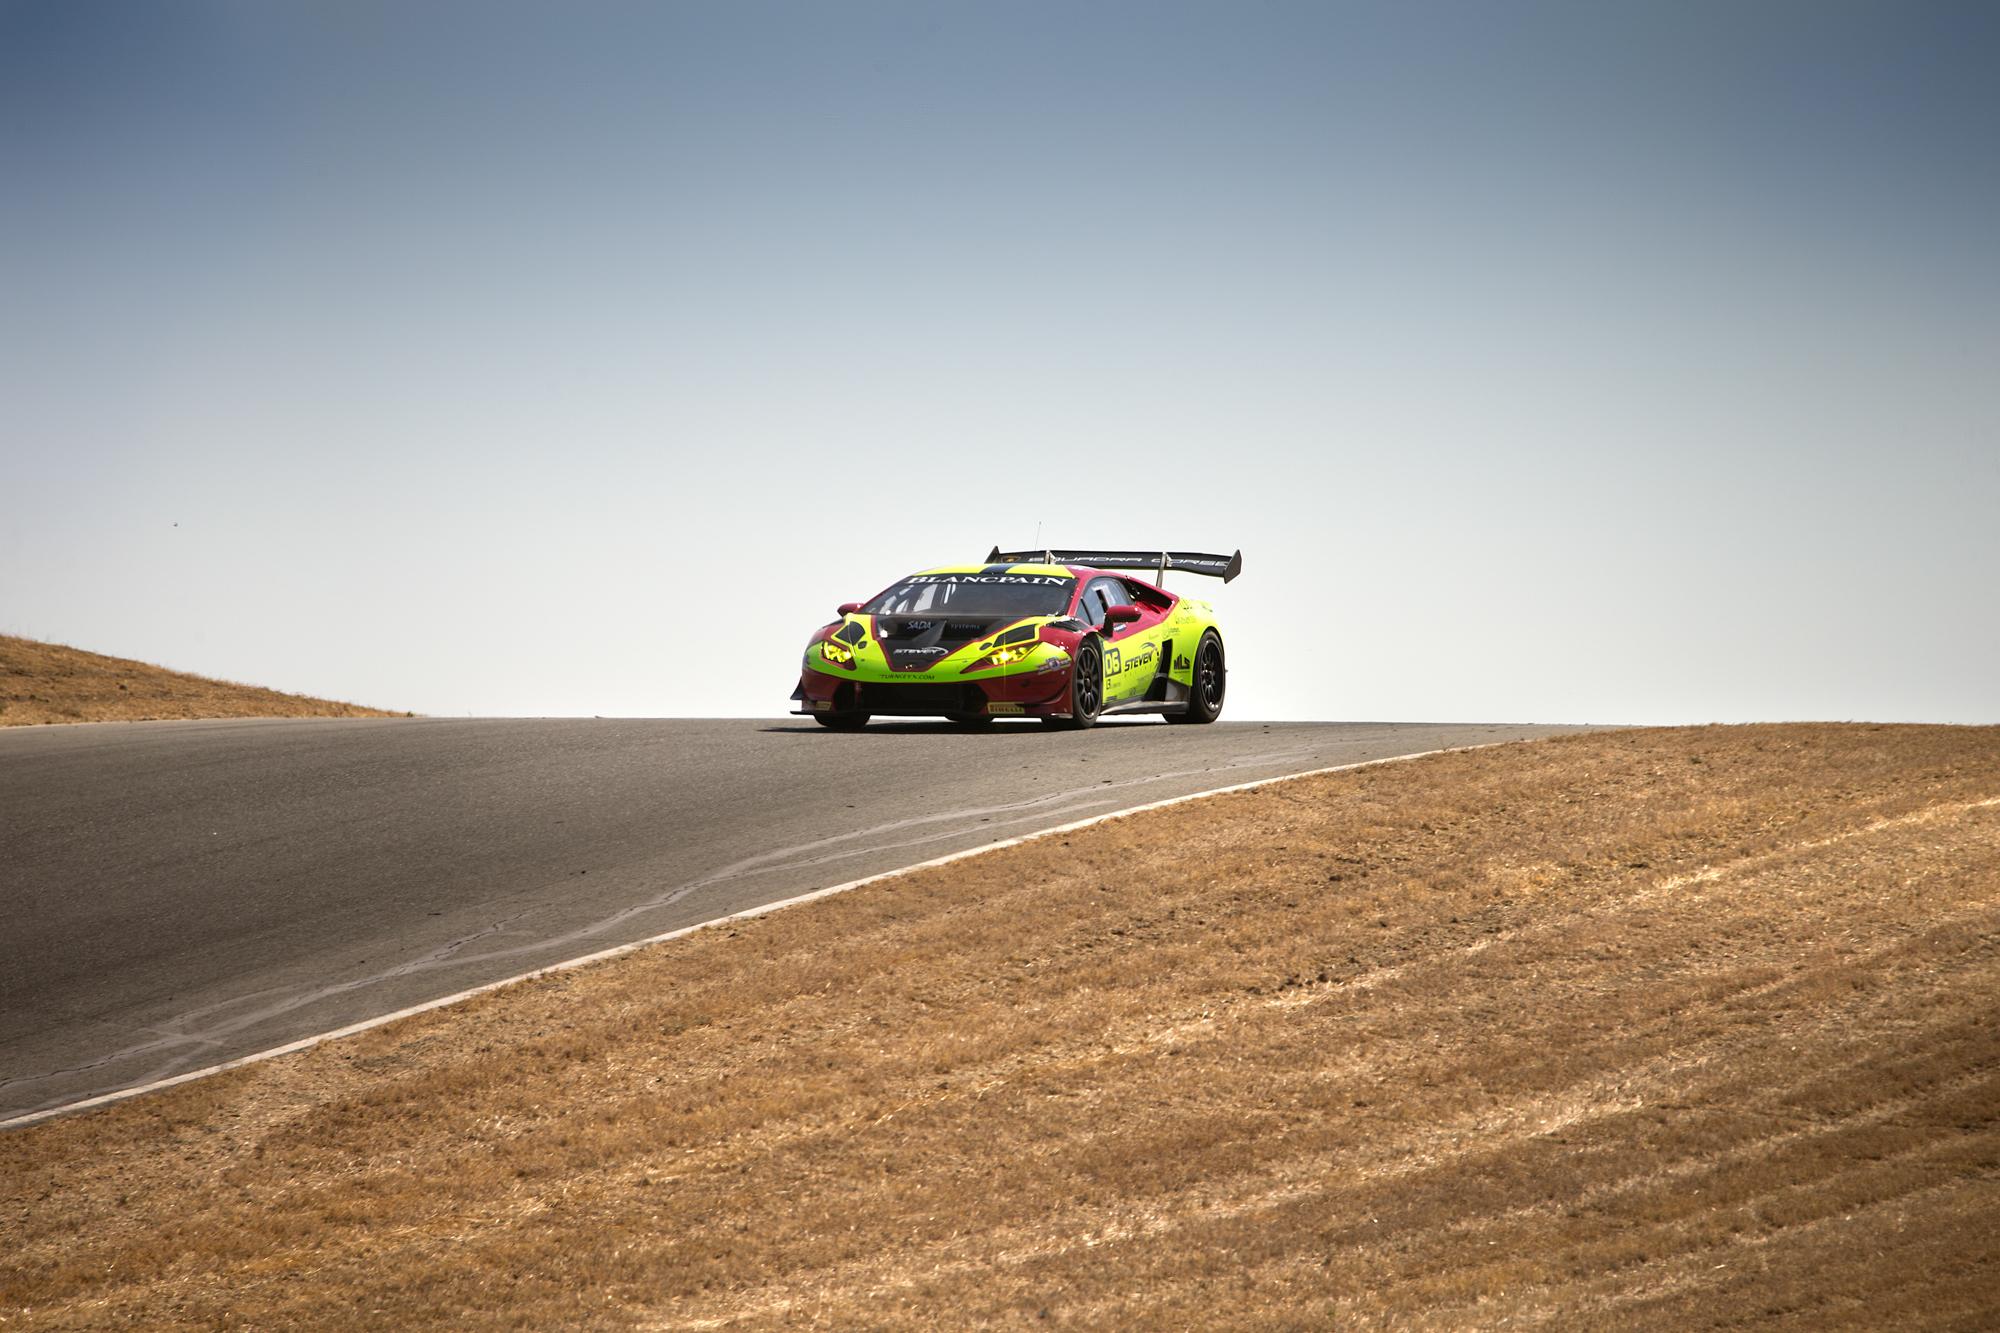 Steven-Racing-20171007-45348.jpg